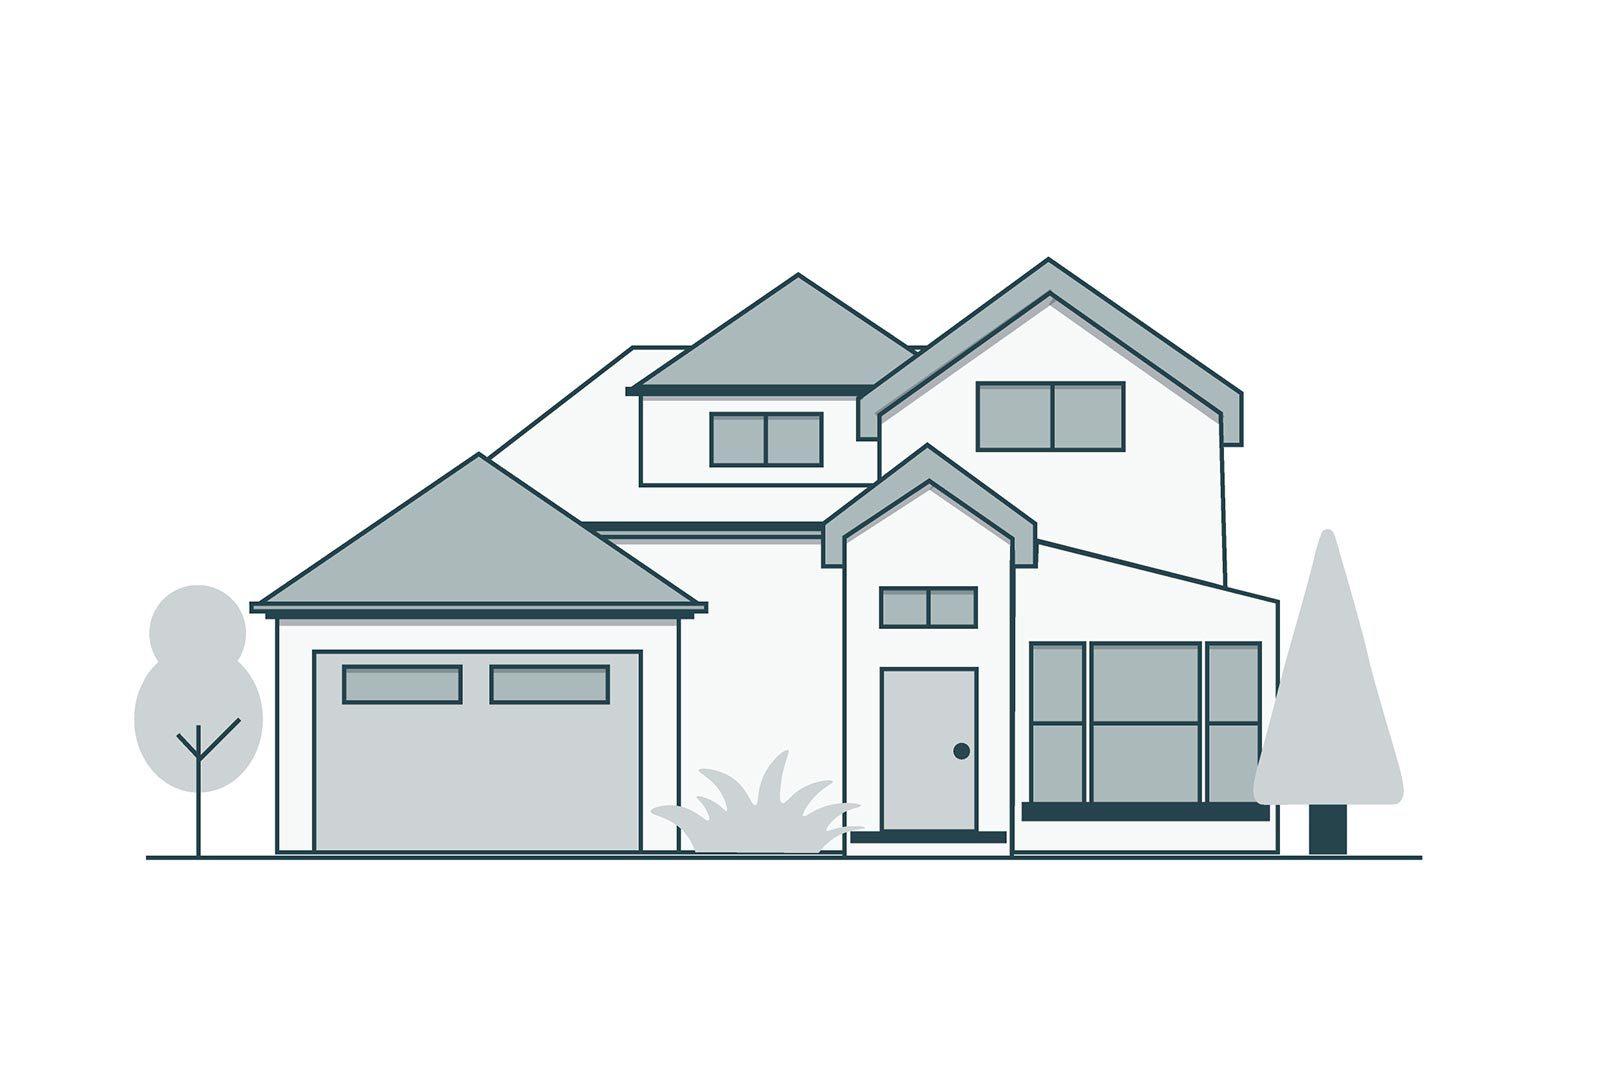 1025 Ashbury St San Francisco, CA 94117